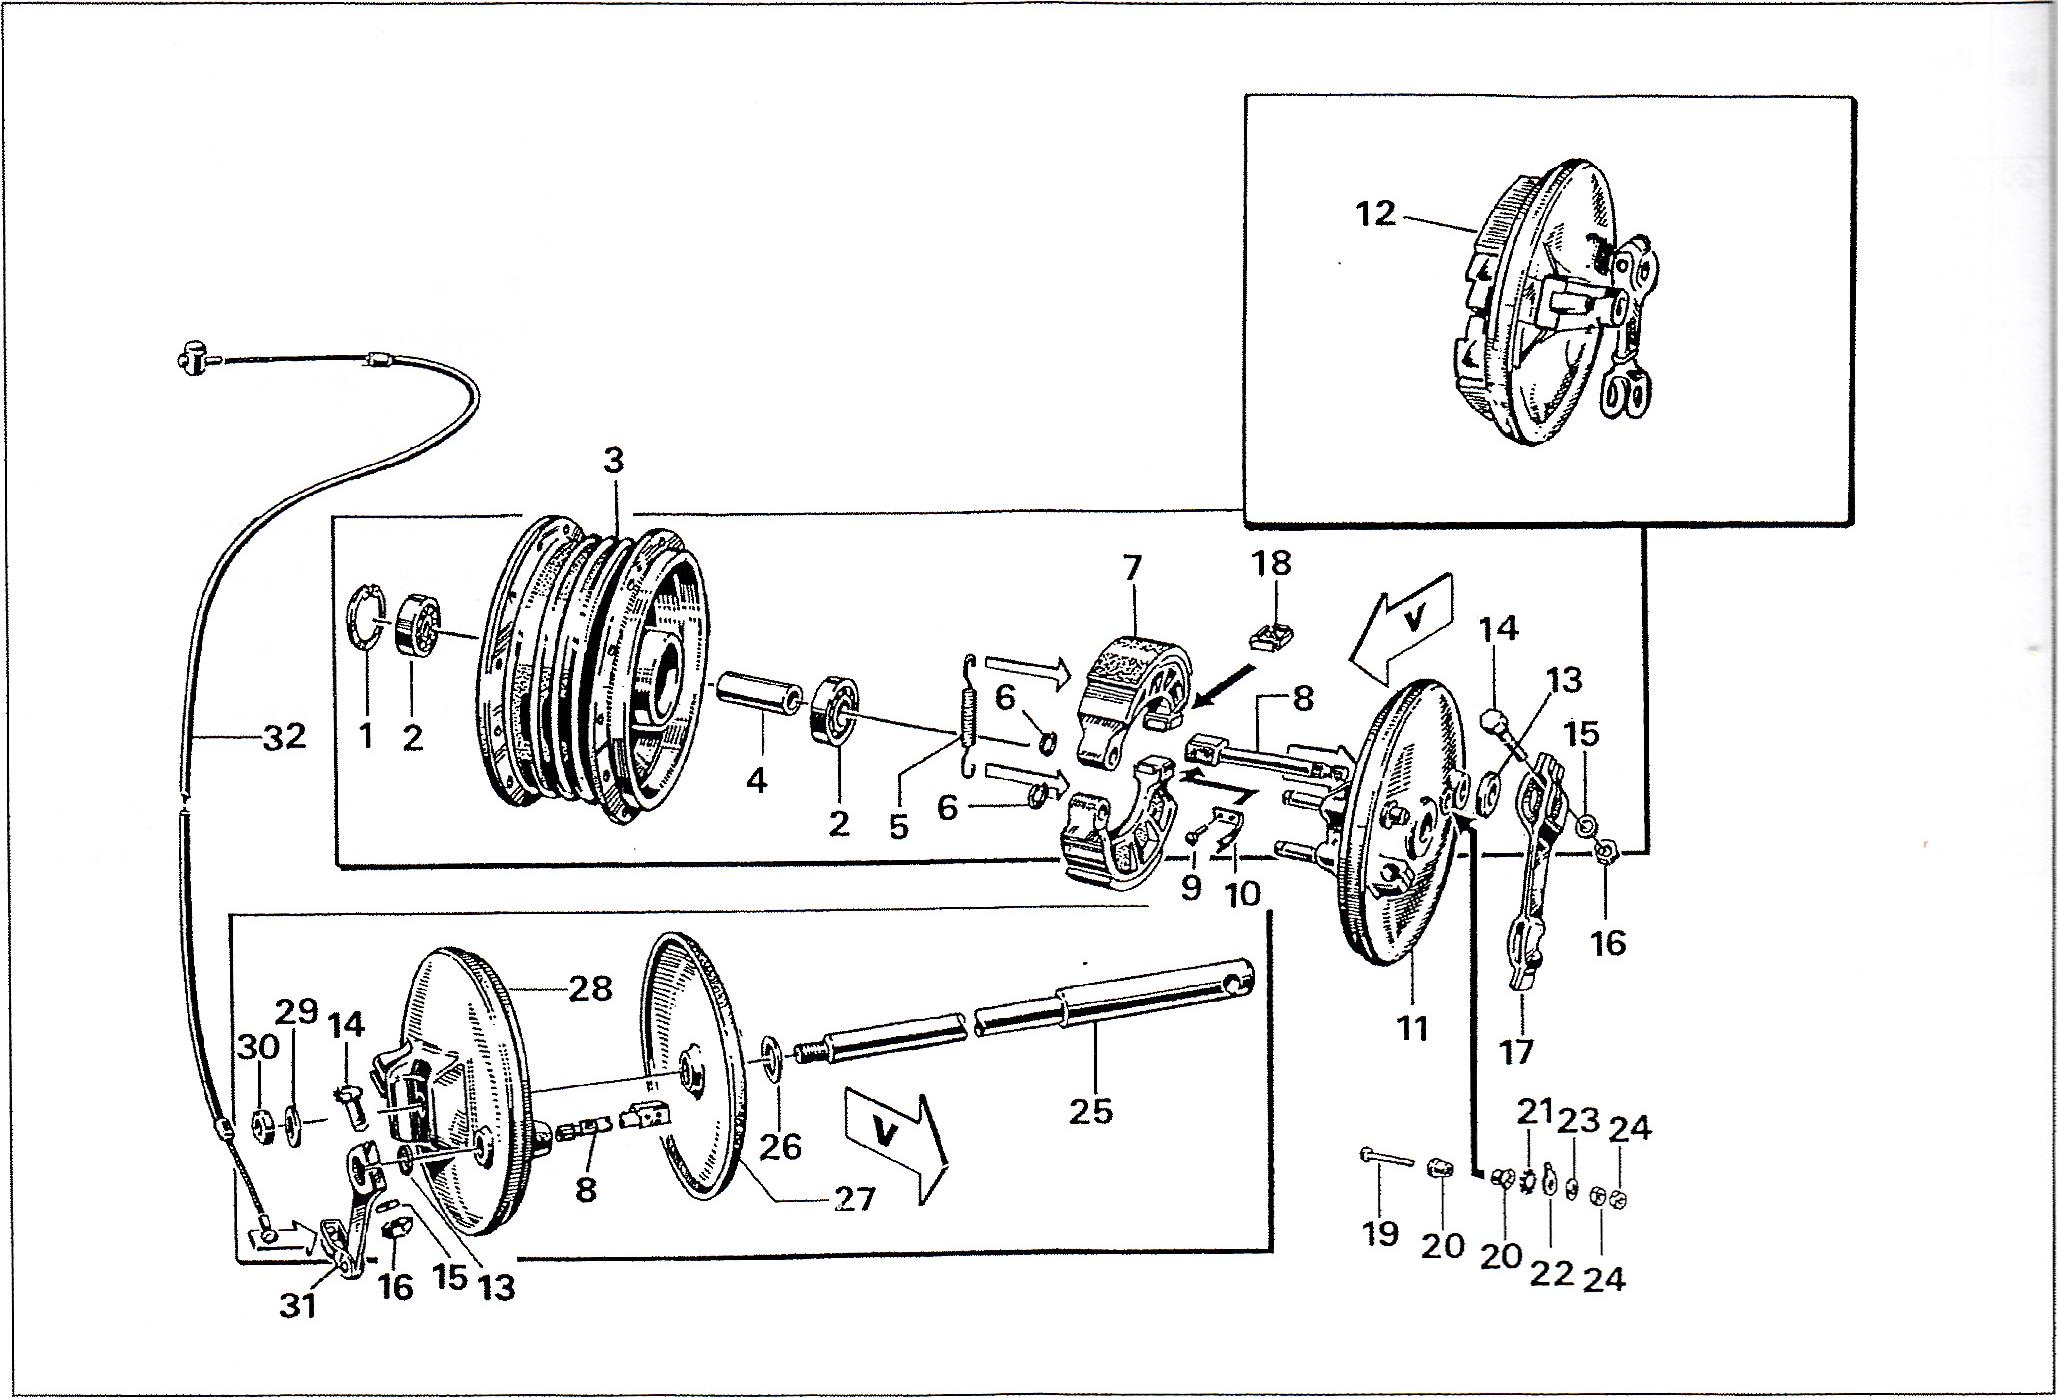 Simson S51 - Drum brake and hubs